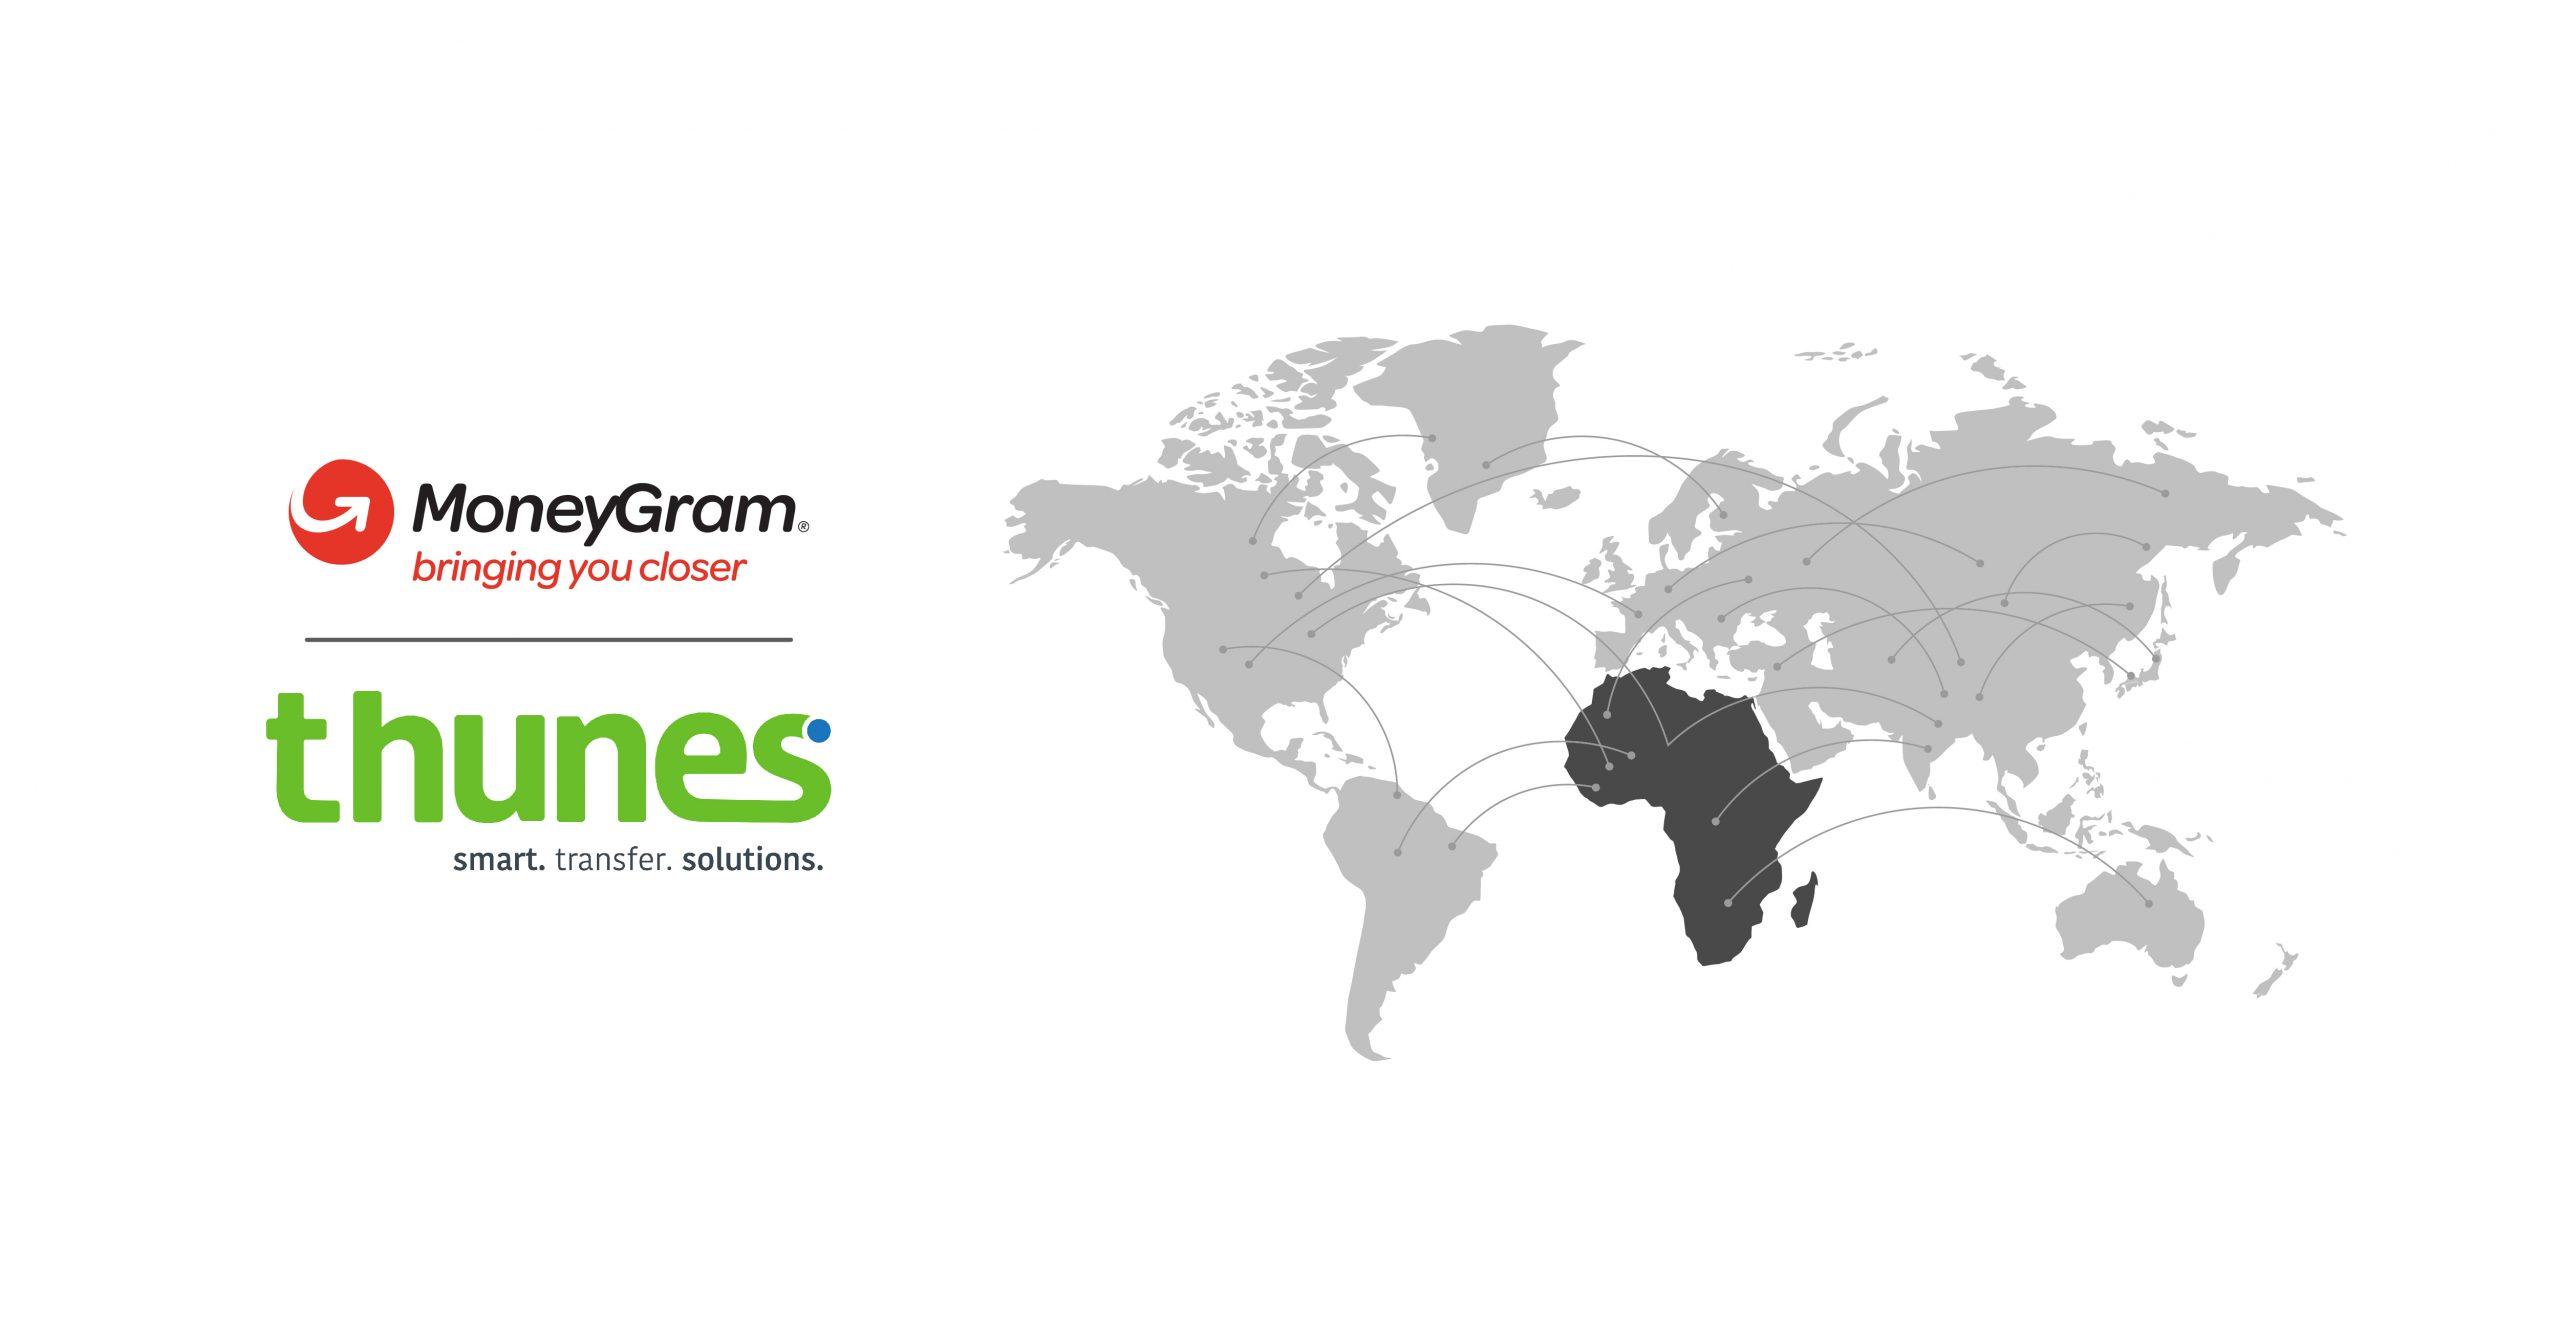 Partnership between Thunes and MoneyGram